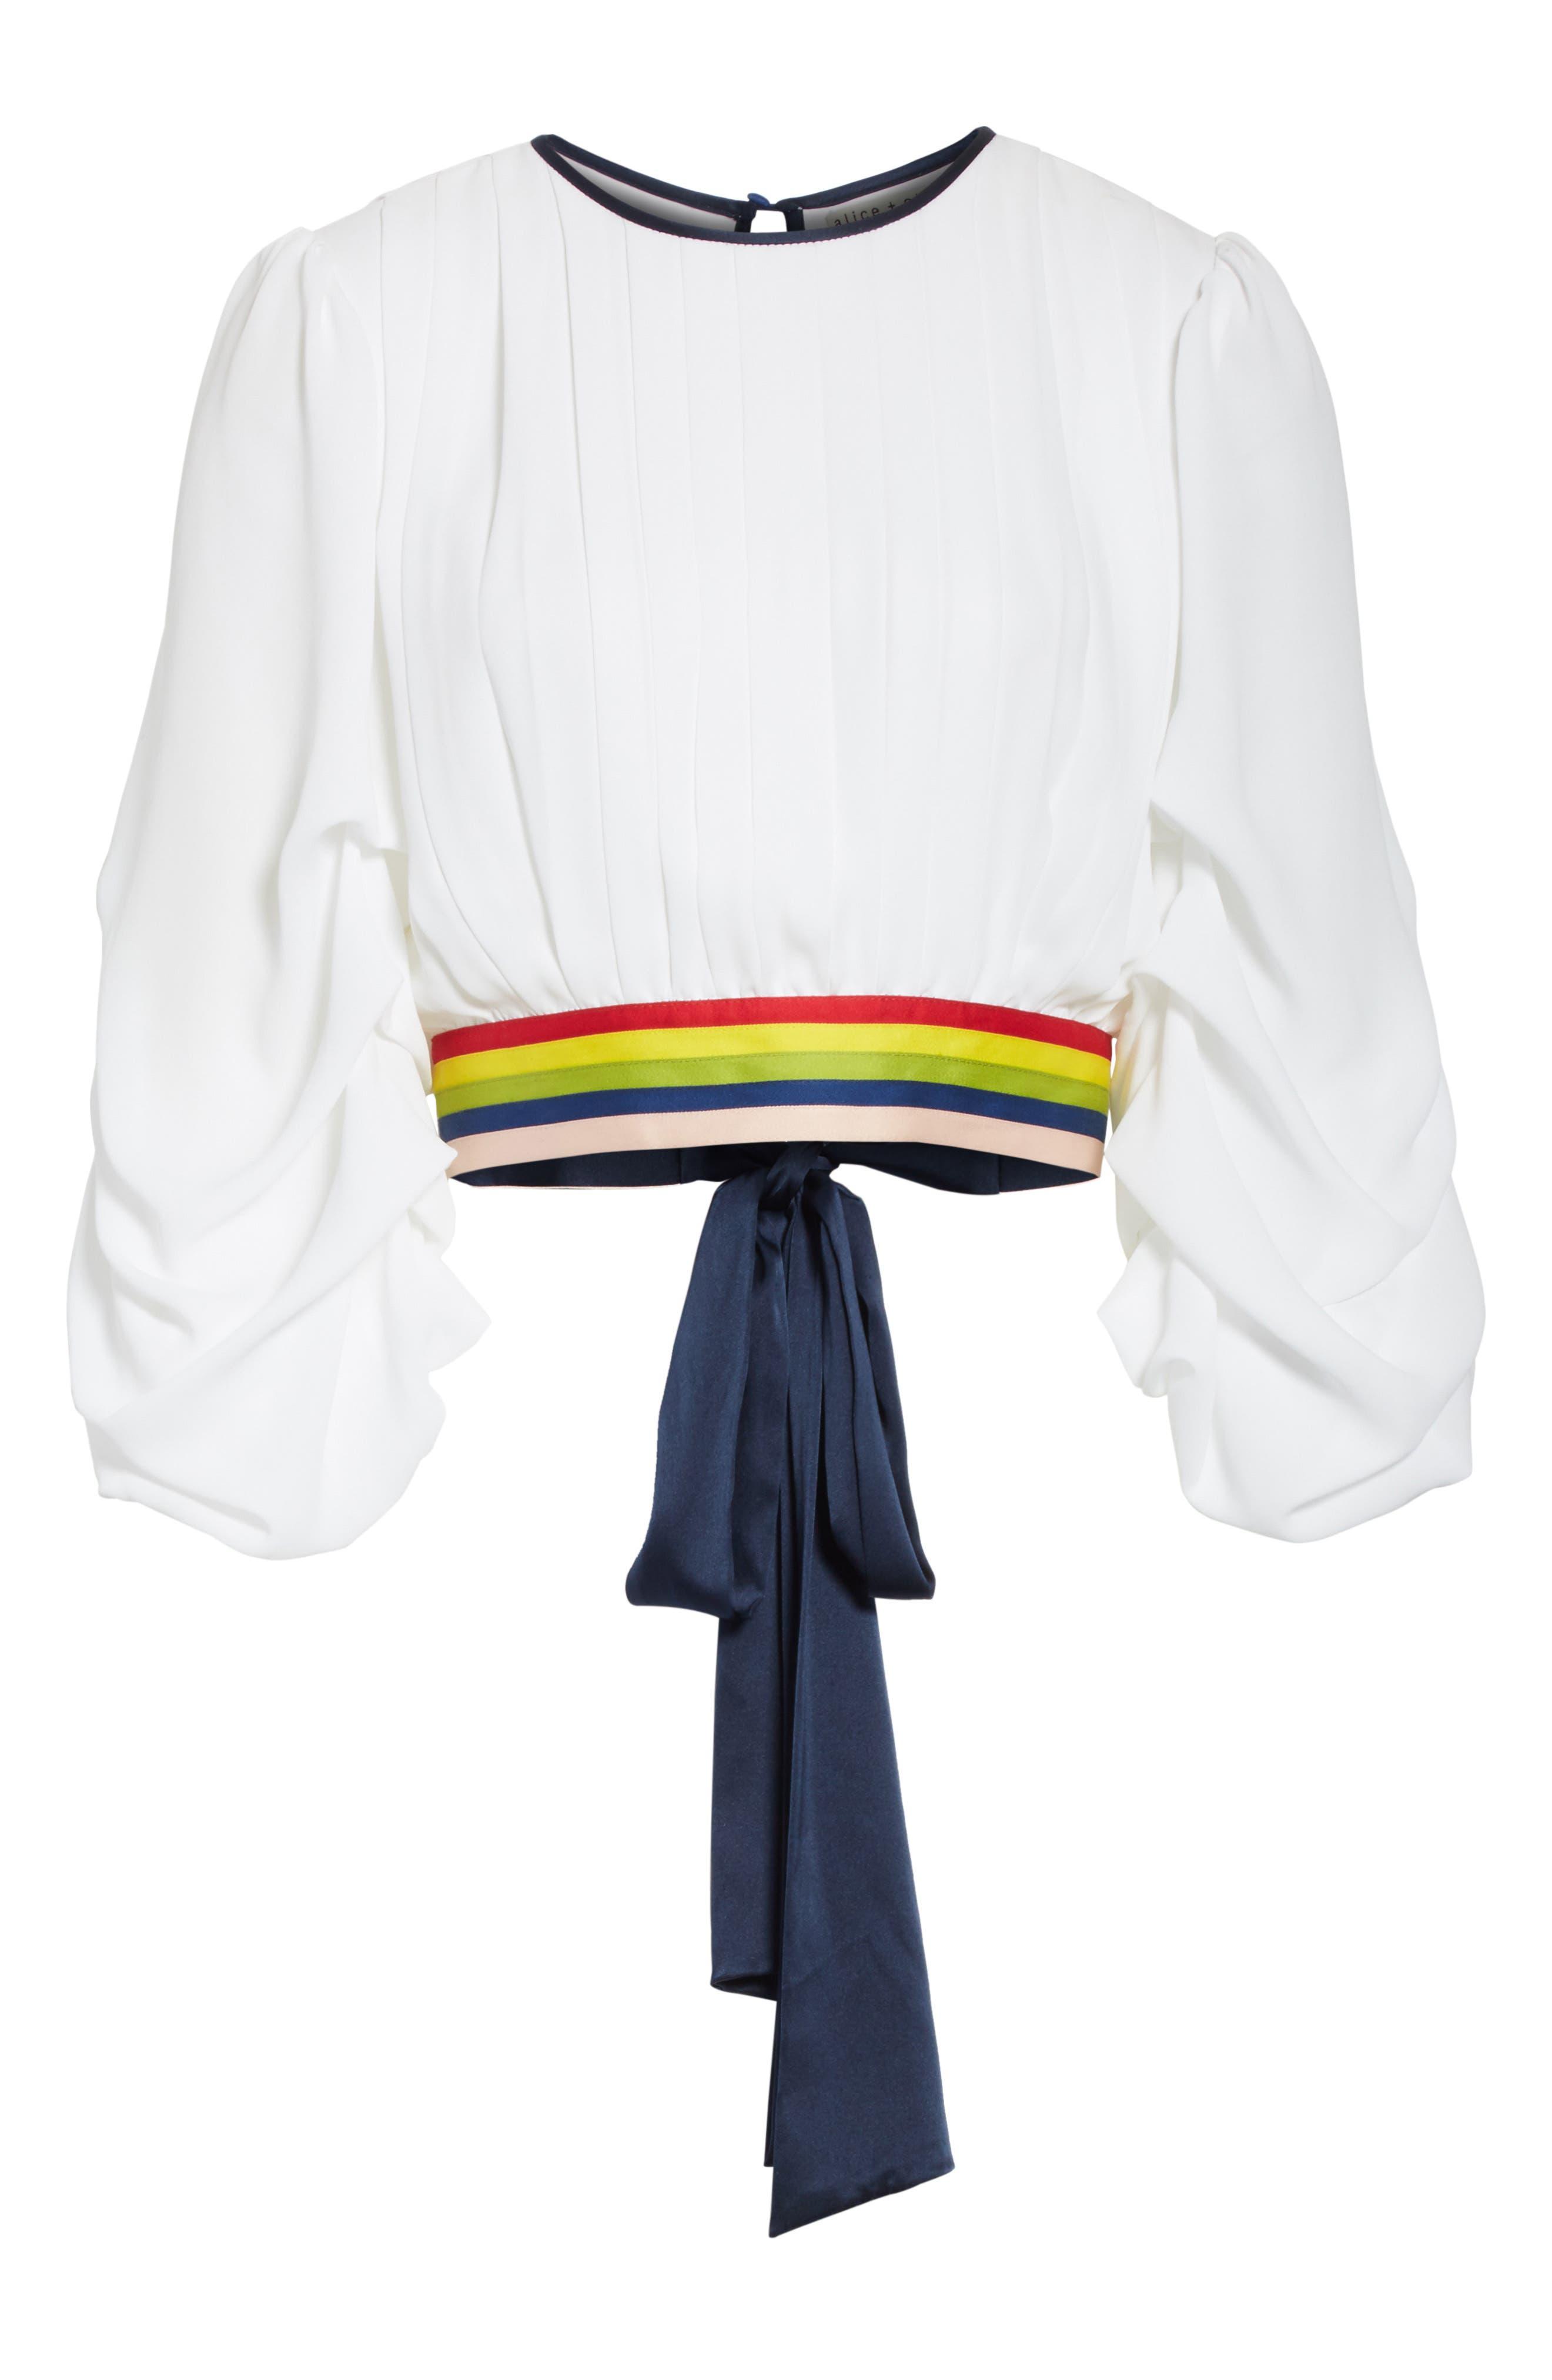 Dakota Tack Sleeve Top,                             Alternate thumbnail 6, color,                             180